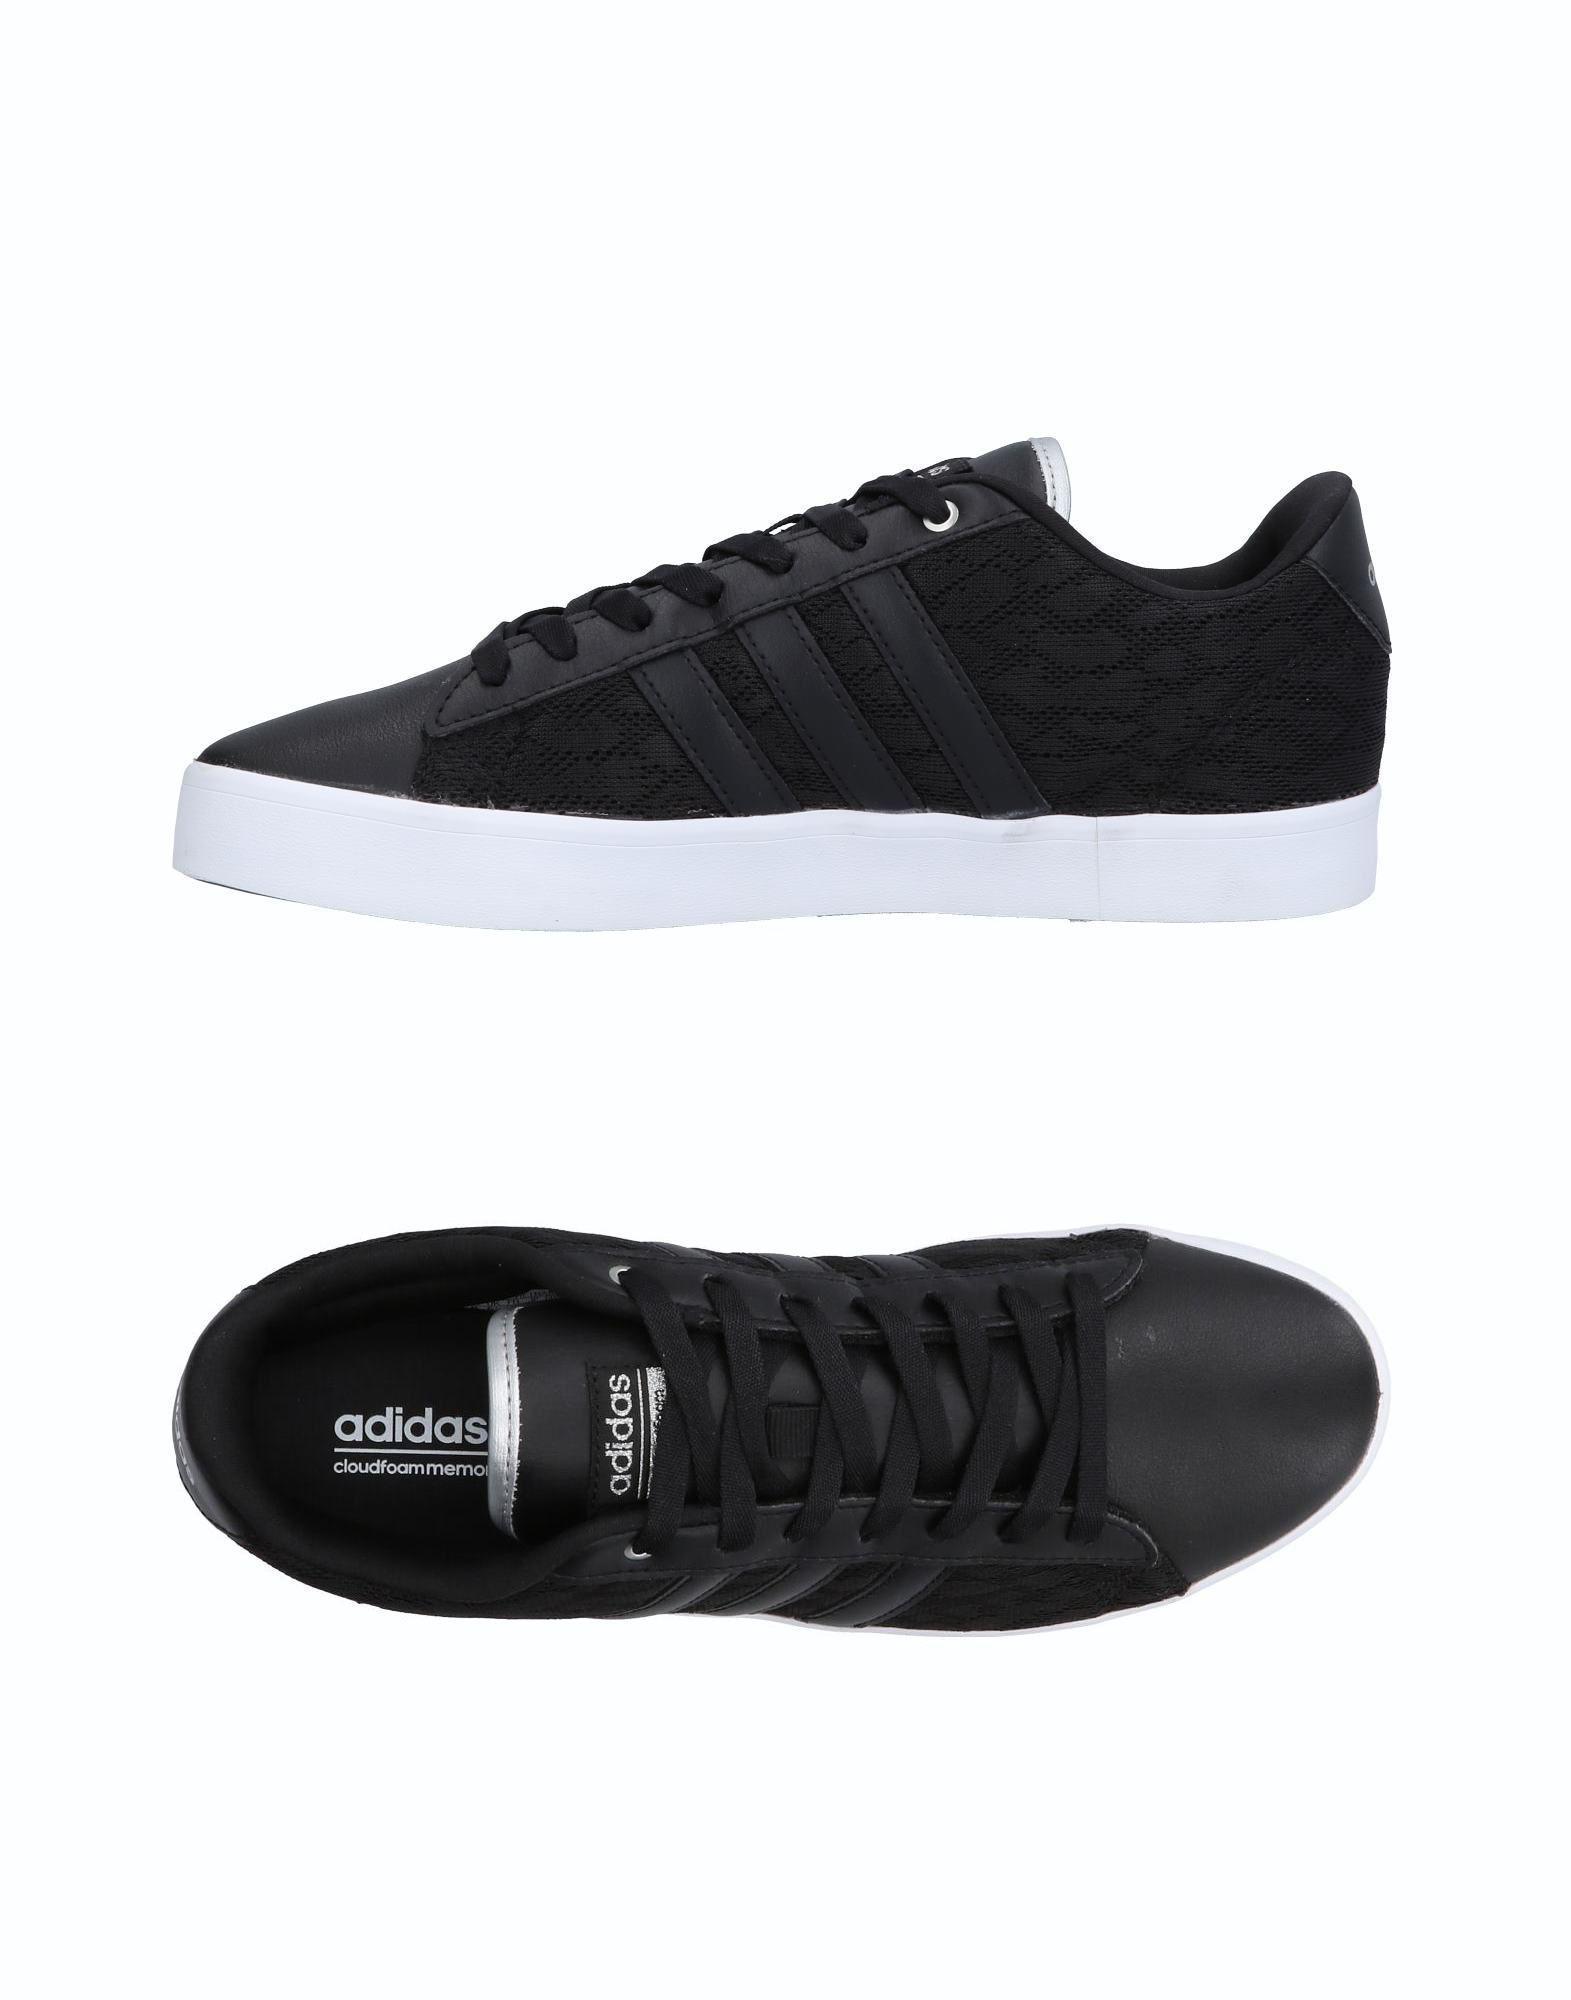 premium selection 70884 b0165 Adidas Neo Low-tops   Sneakers in Black - Lyst